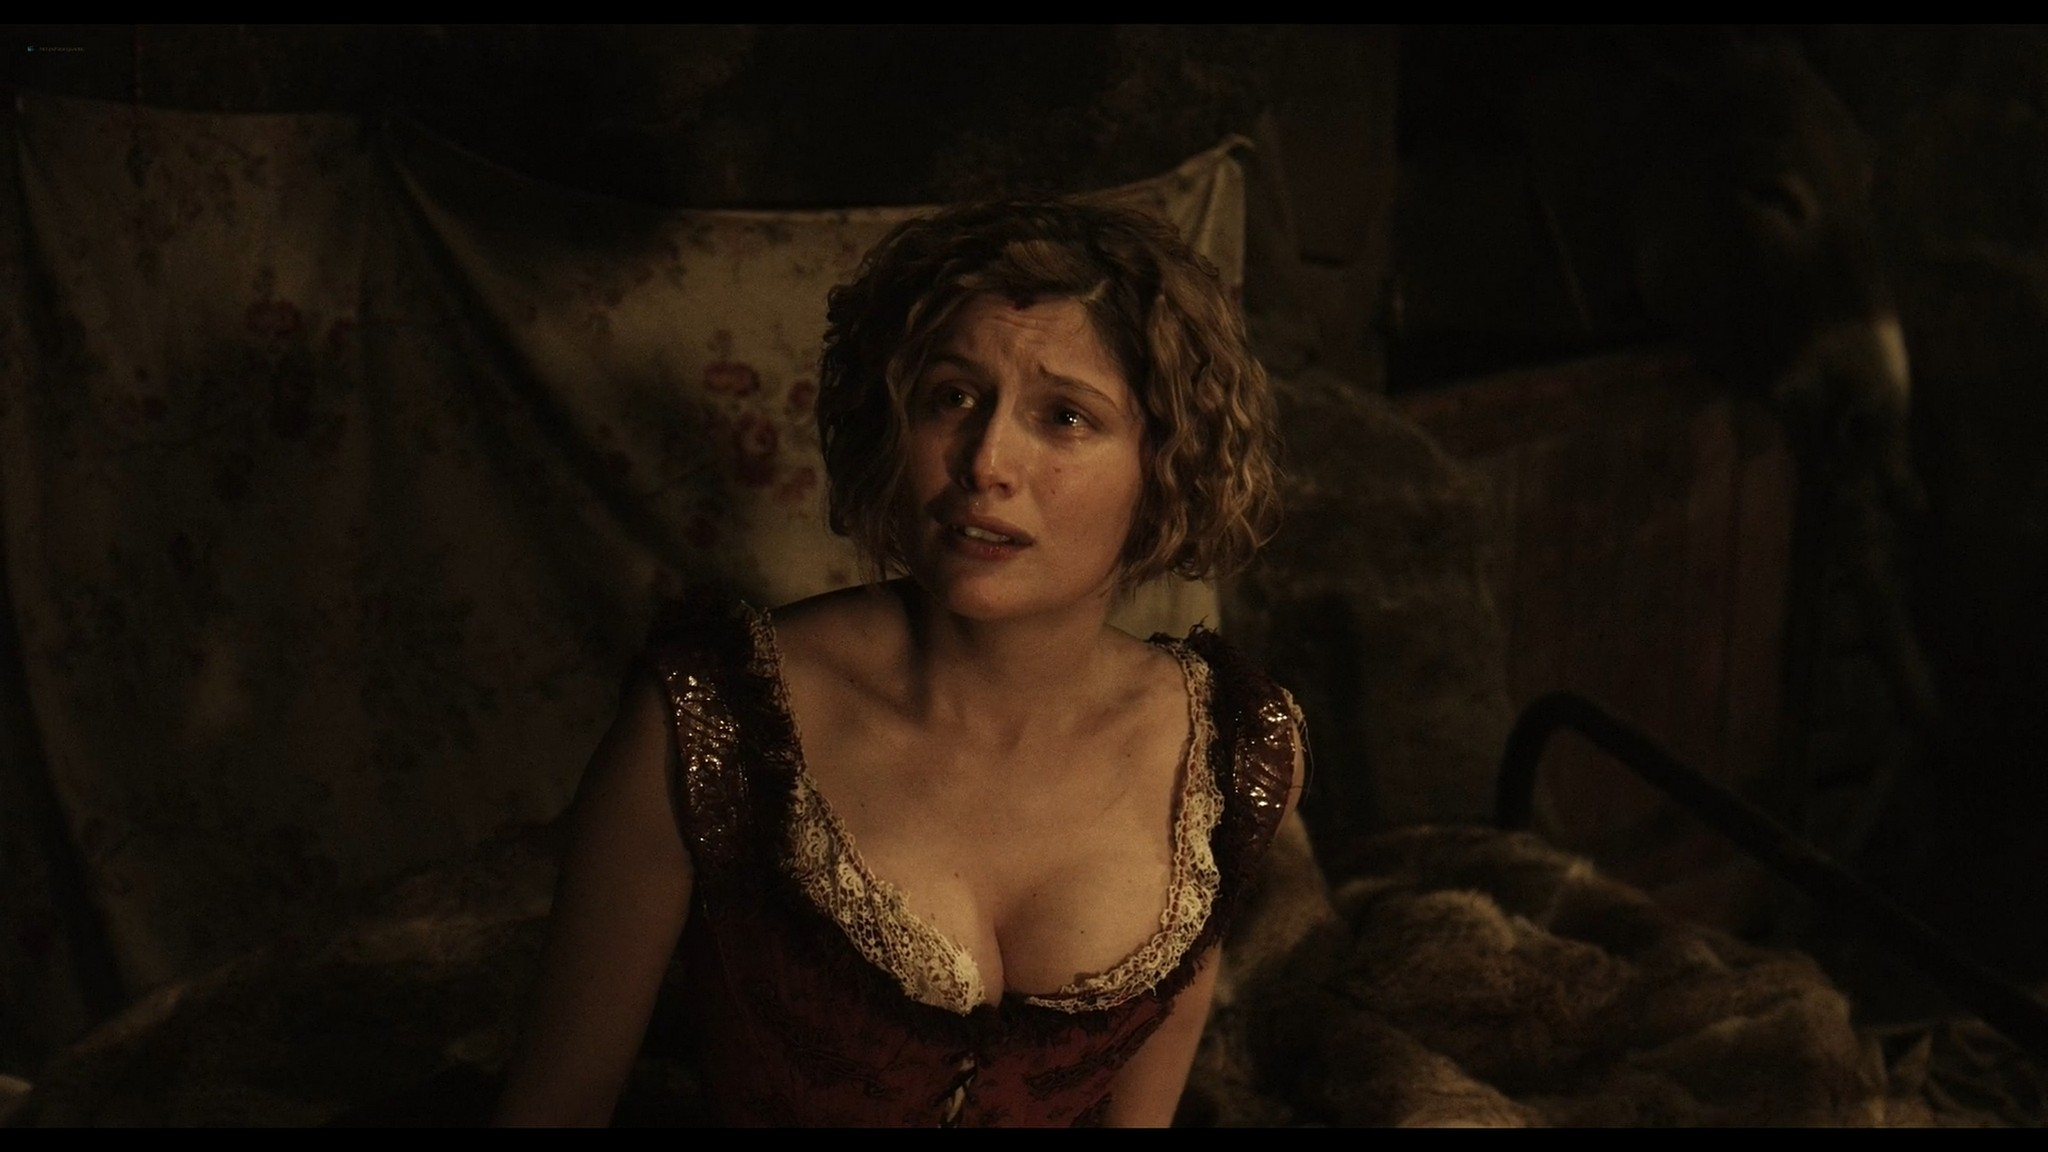 Laetitia Casta nude topless and very hot La jeune fille et les loups 2007 HD 1080p BluRay 6